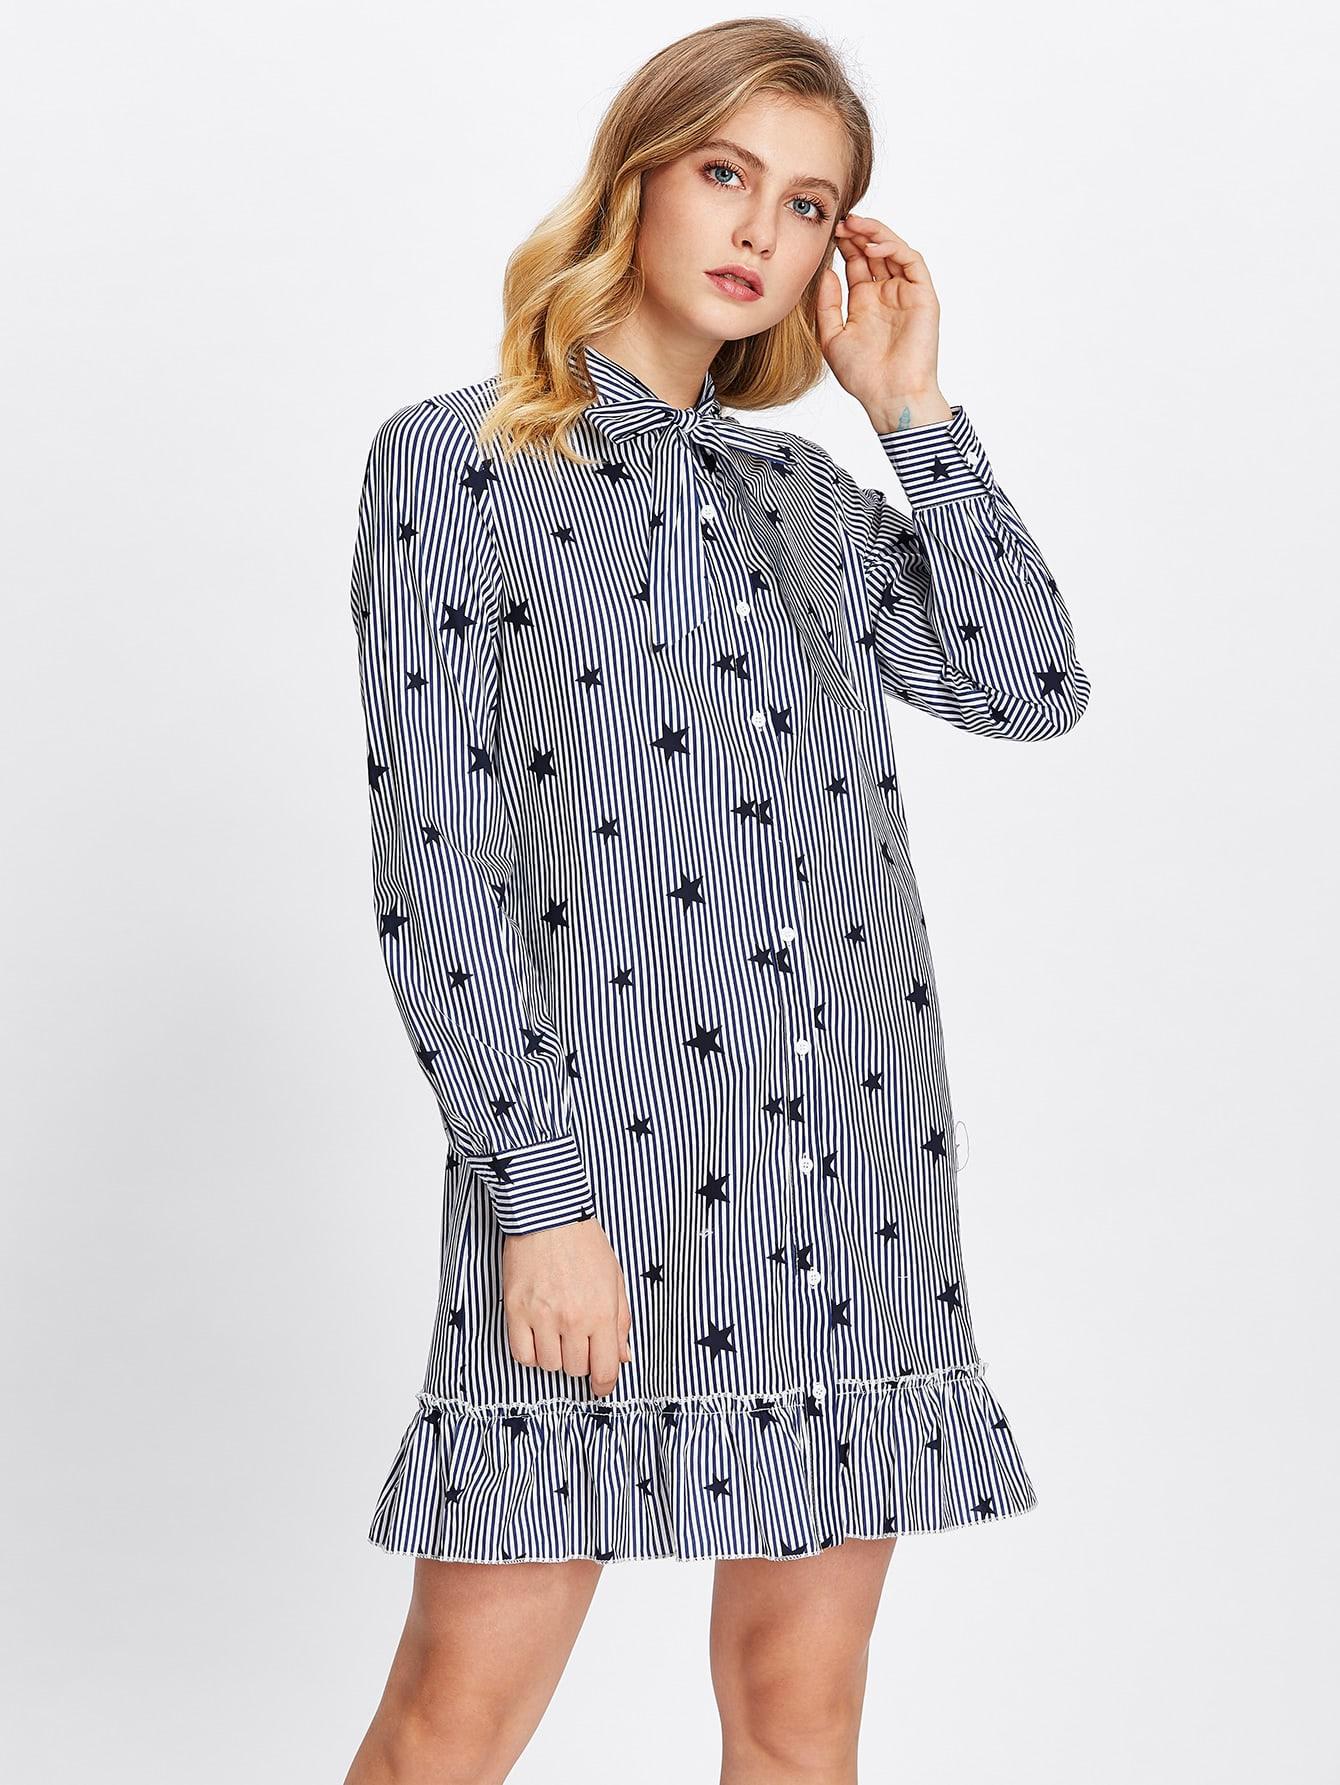 Tie Neck Frill Hem Mixed Print Shirt Dress feron лепнина 11318